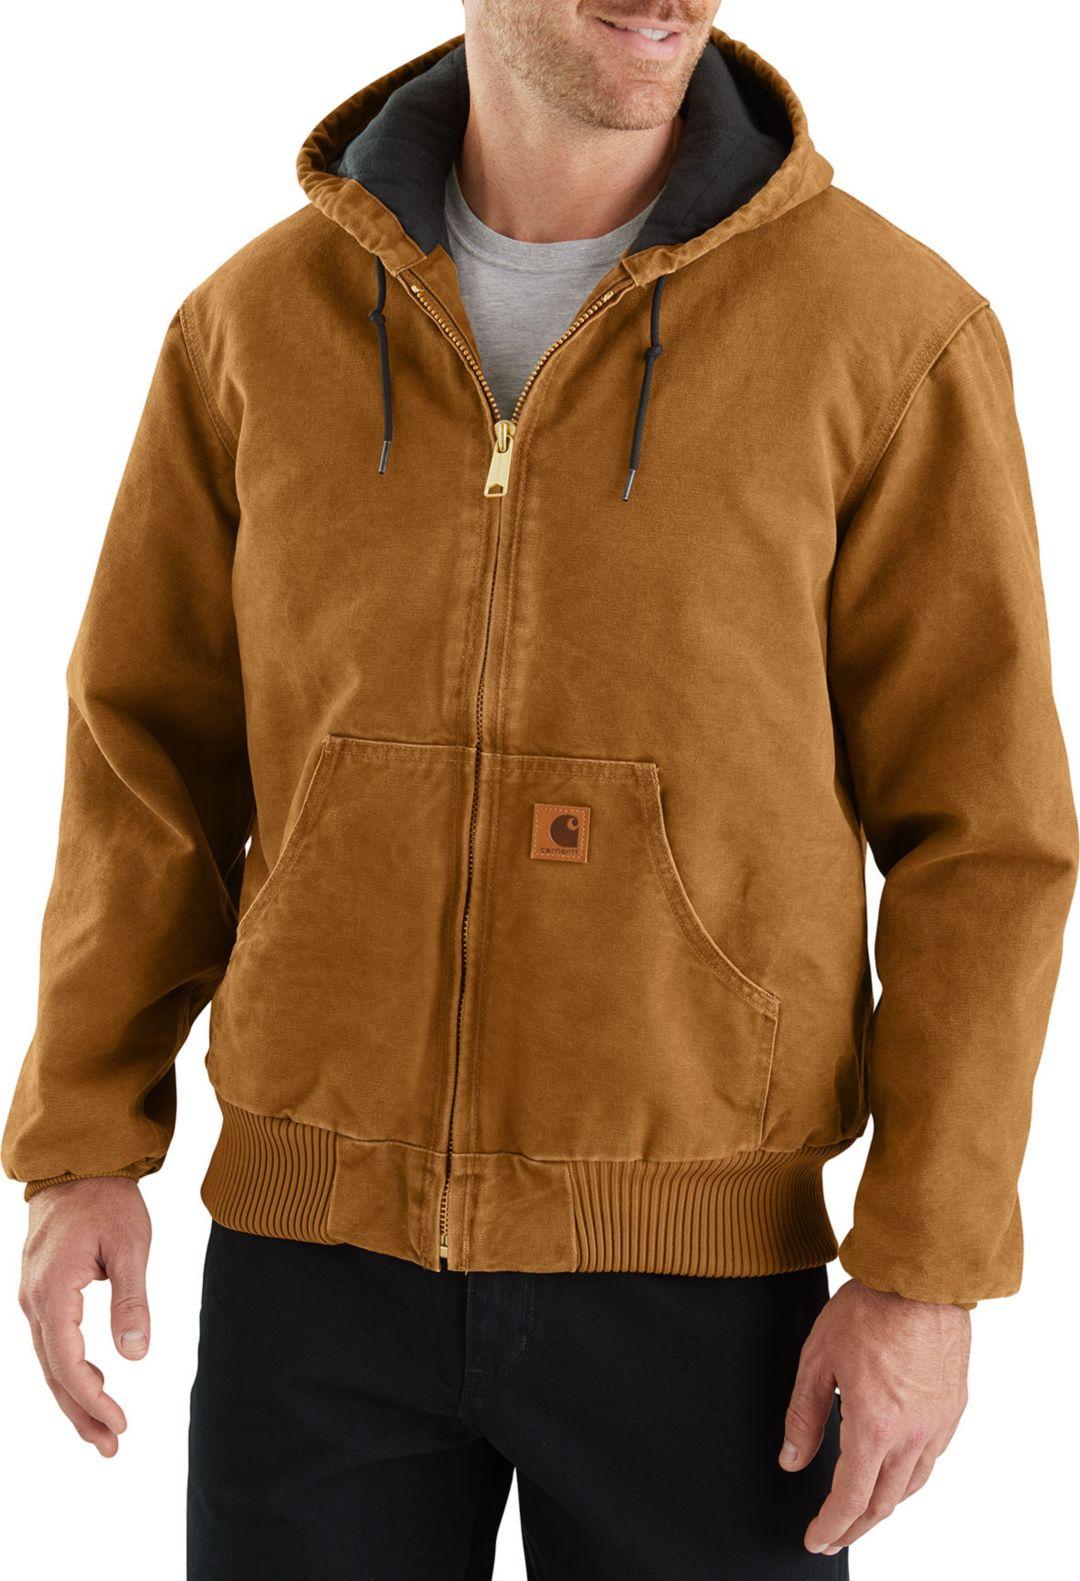 ed541b471b Carhartt Men's Sandstone Active Lined Jacket | Field & Stream